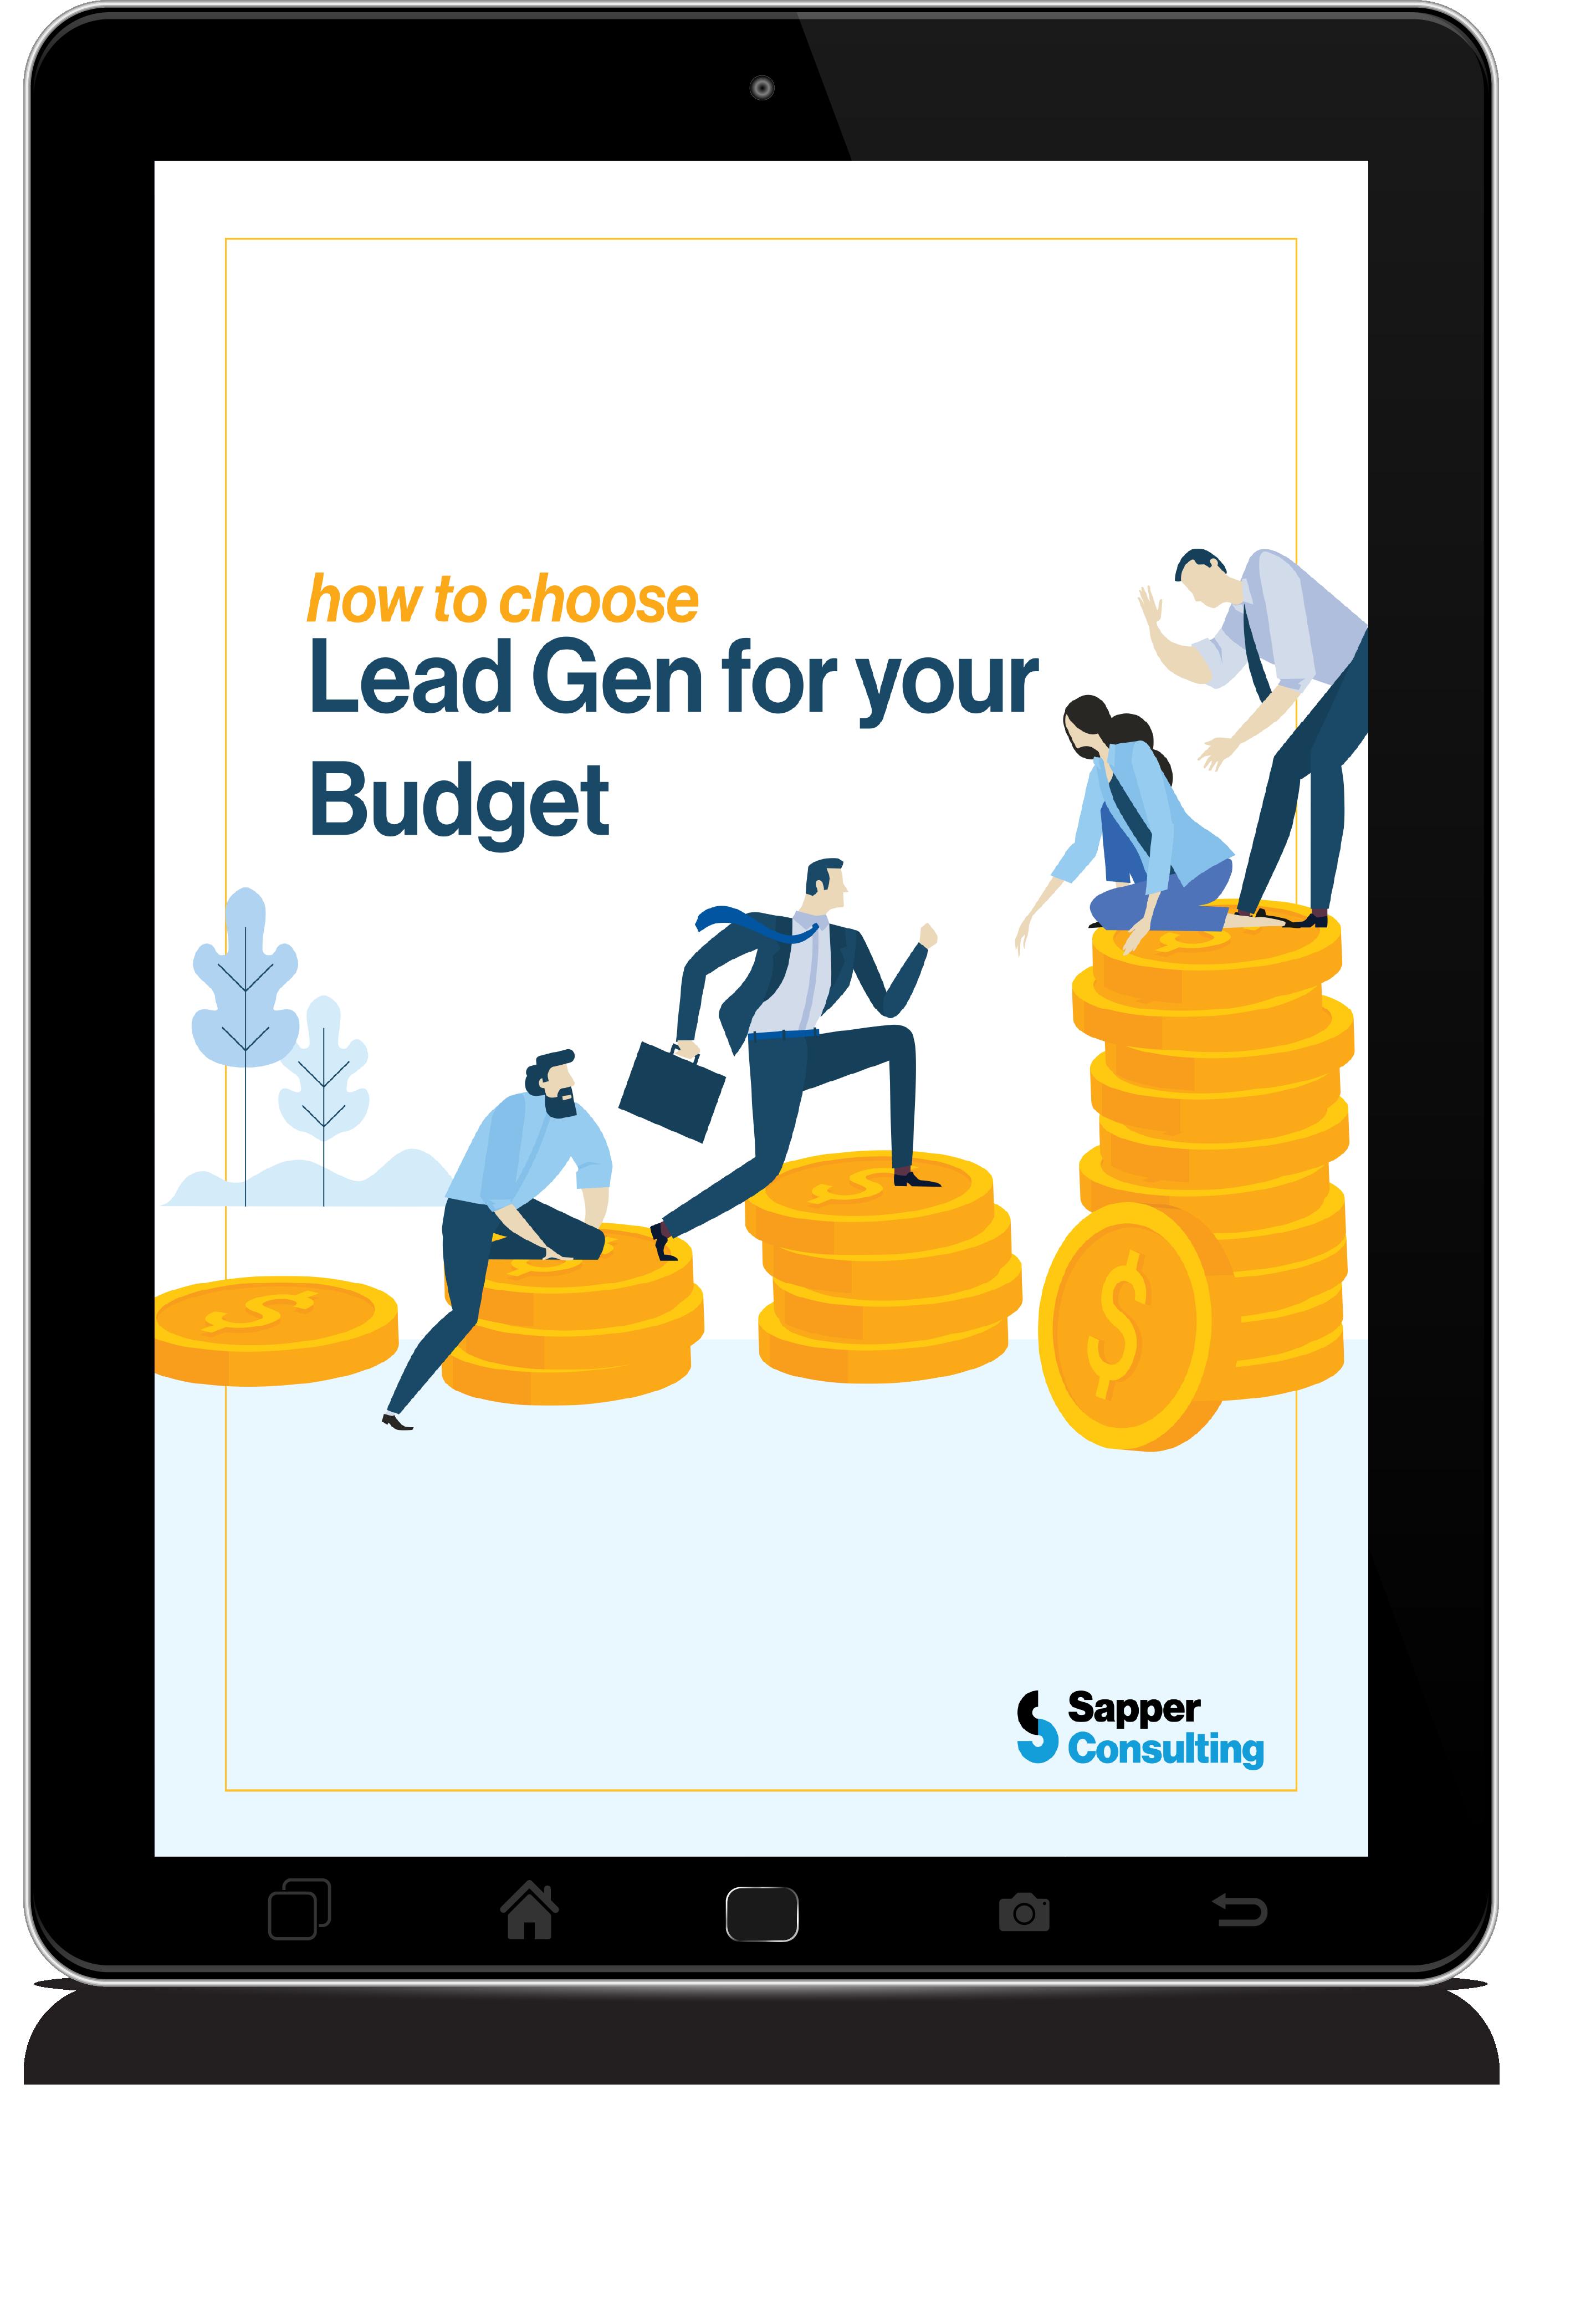 LG for Budget_Thumbnail